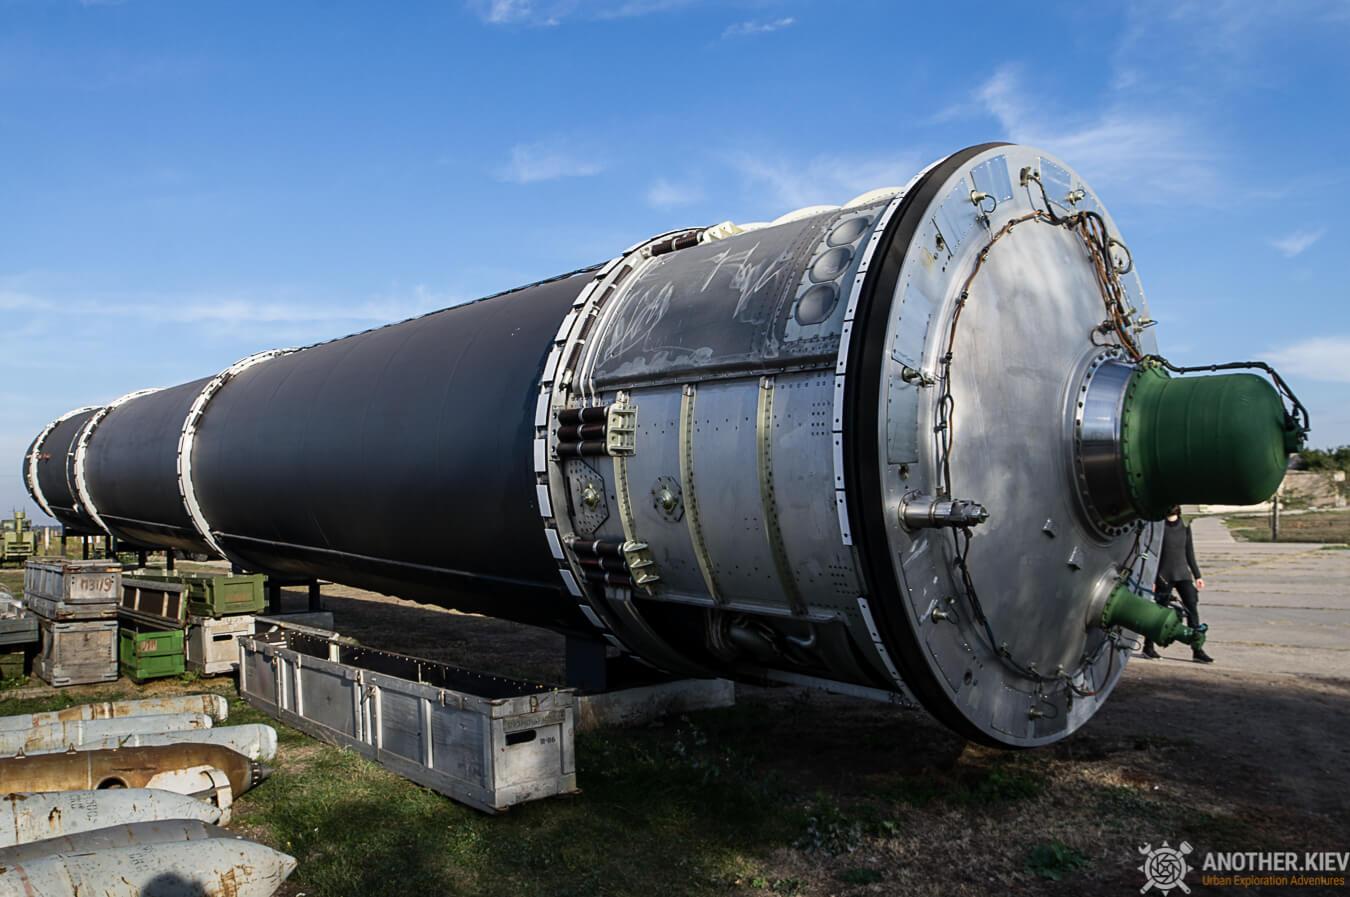 Missilo-6240 Missile Base Tour